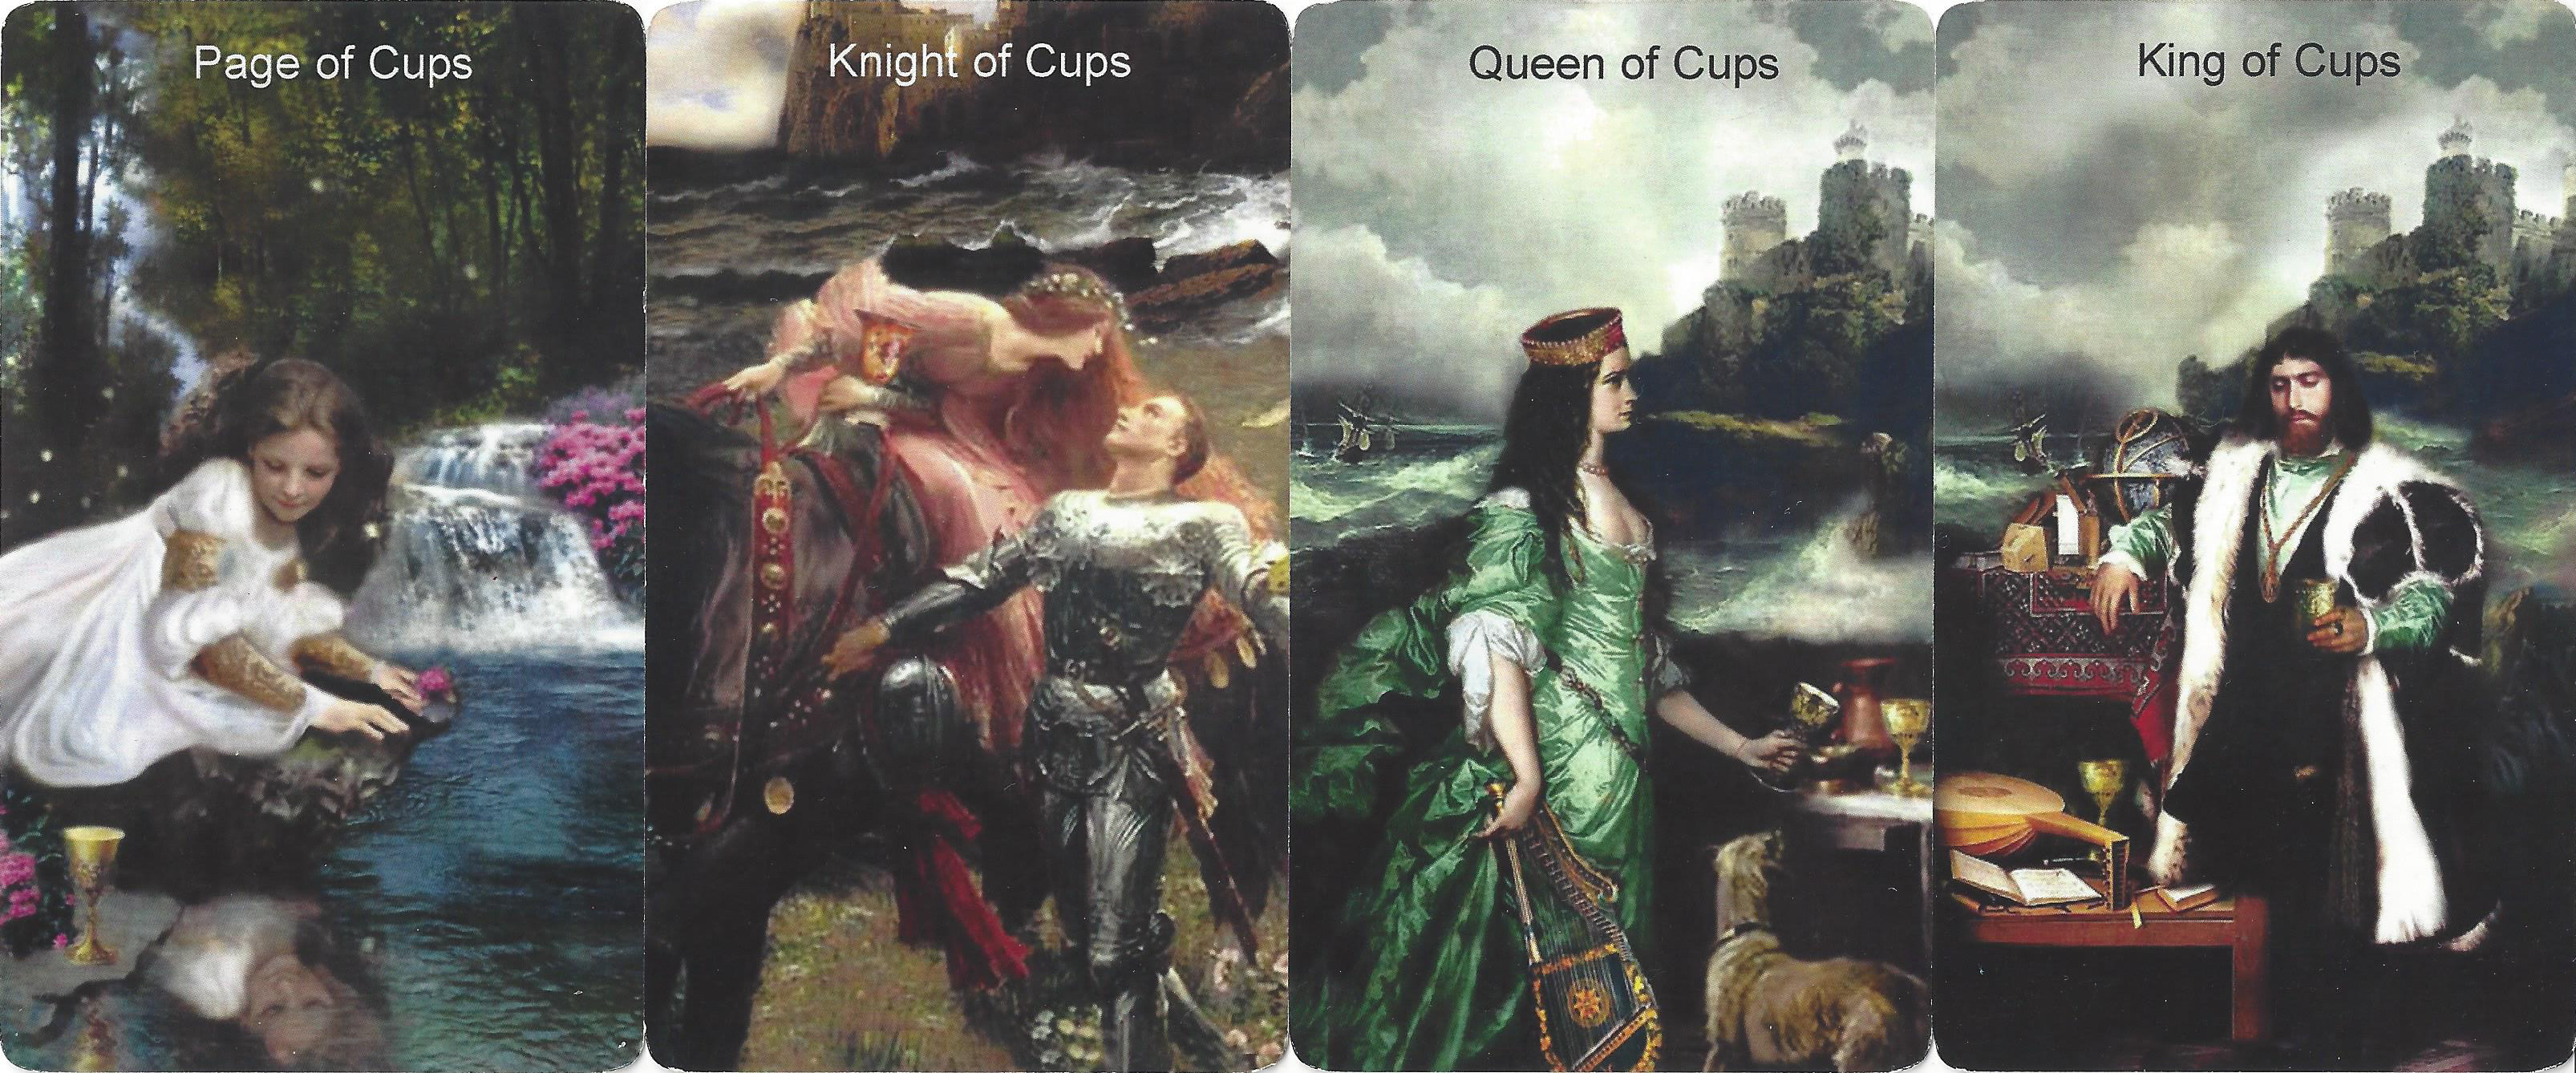 Tarot Suit of Cups in Love Readings - Tarot in Love